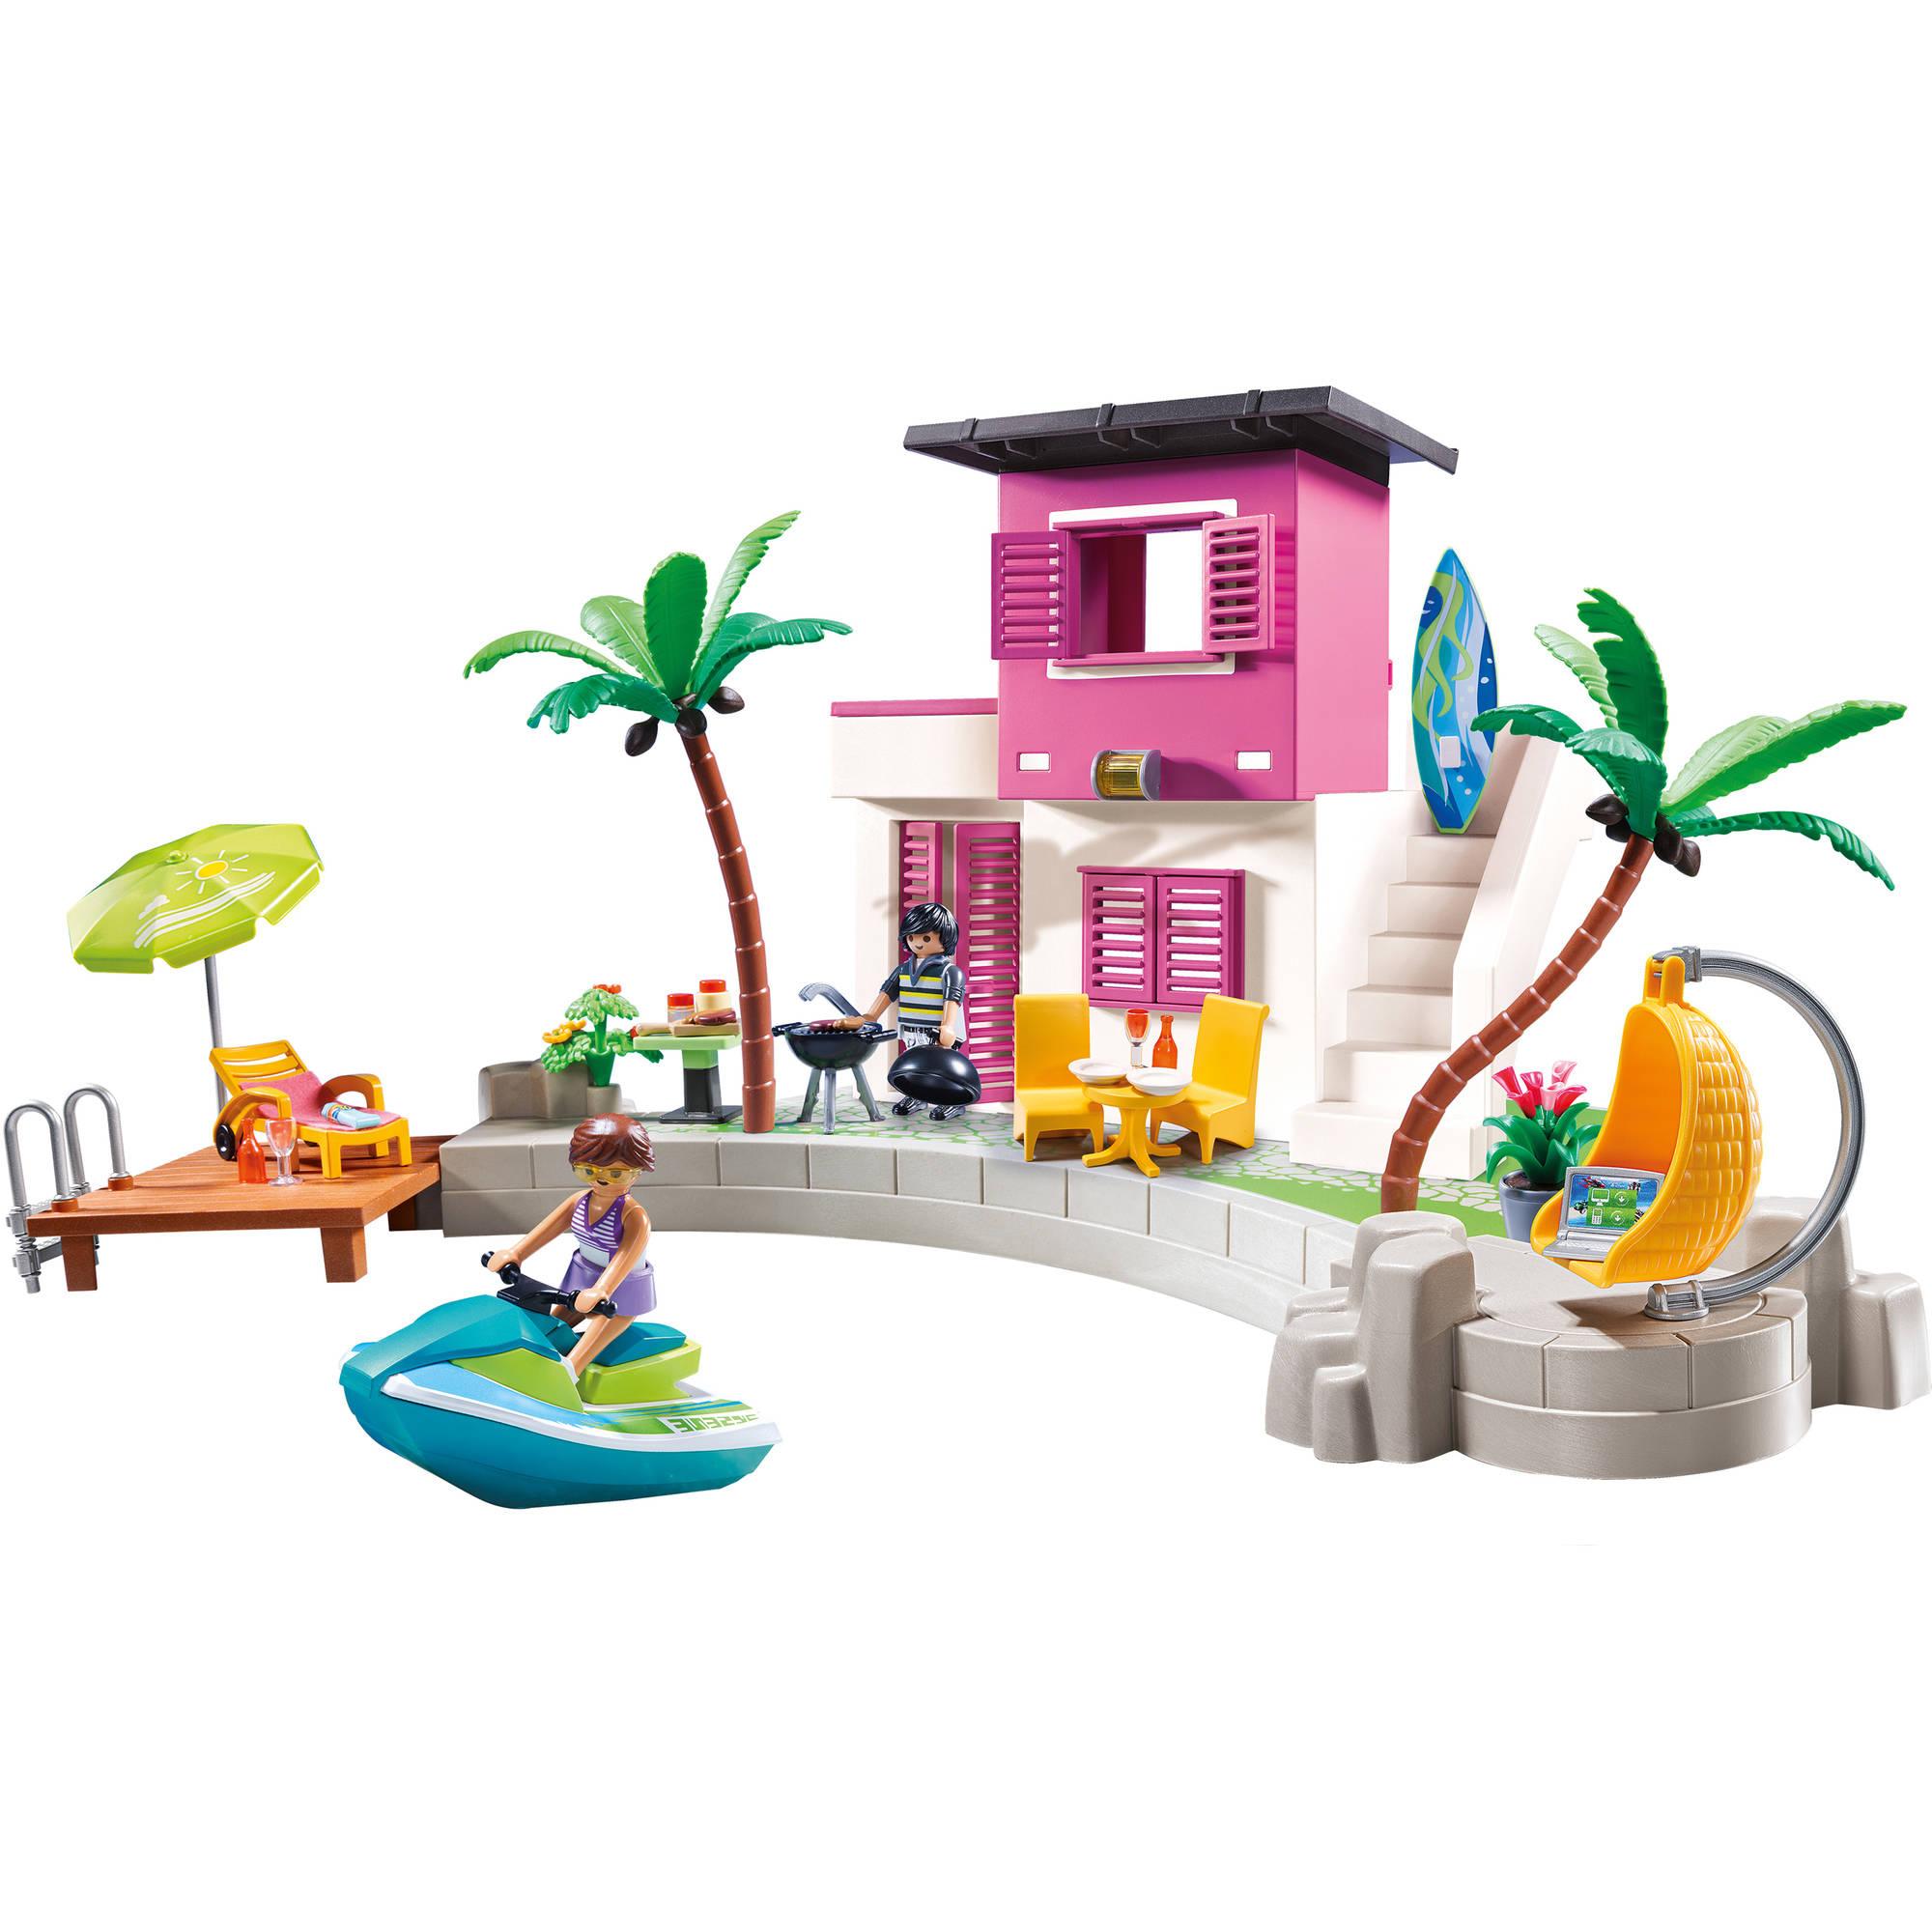 PLAYMOBIL Luxury Beach House - Walmart.com